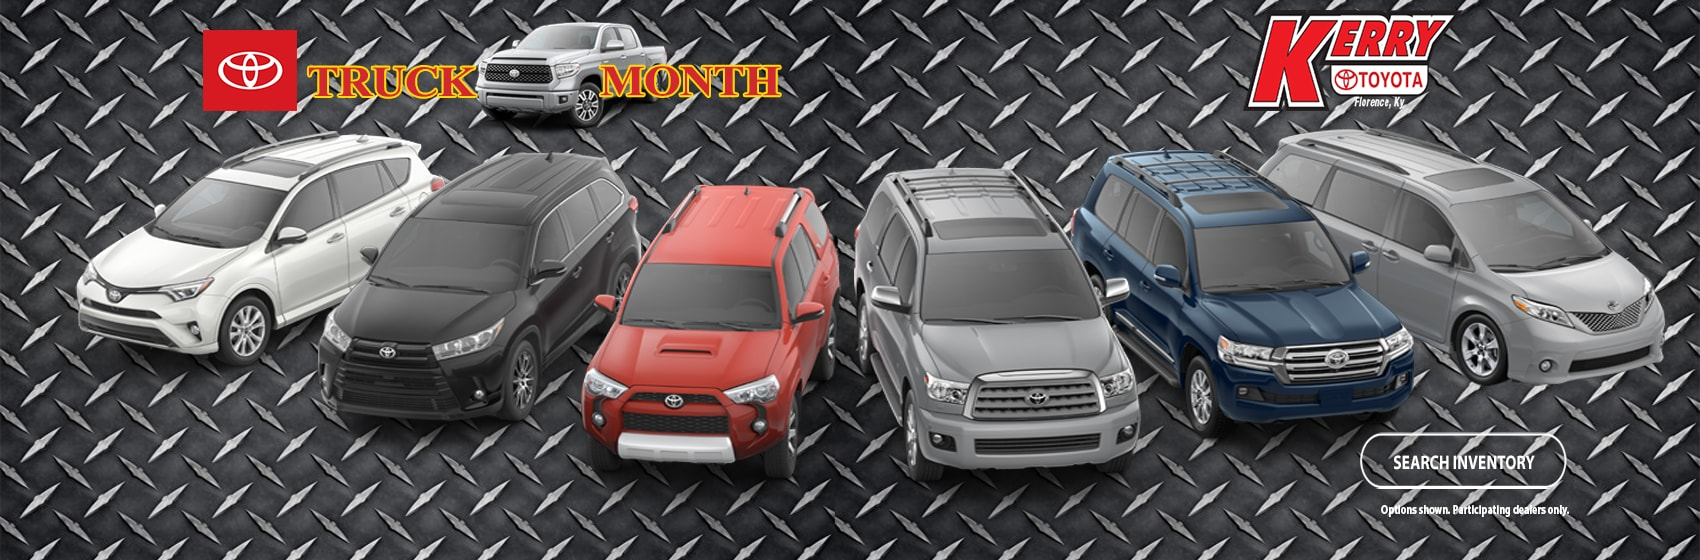 Toyota Florence Ky >> New & Used Kerry Toyota Dealership | Florence, KY Near Cincinnati, OH